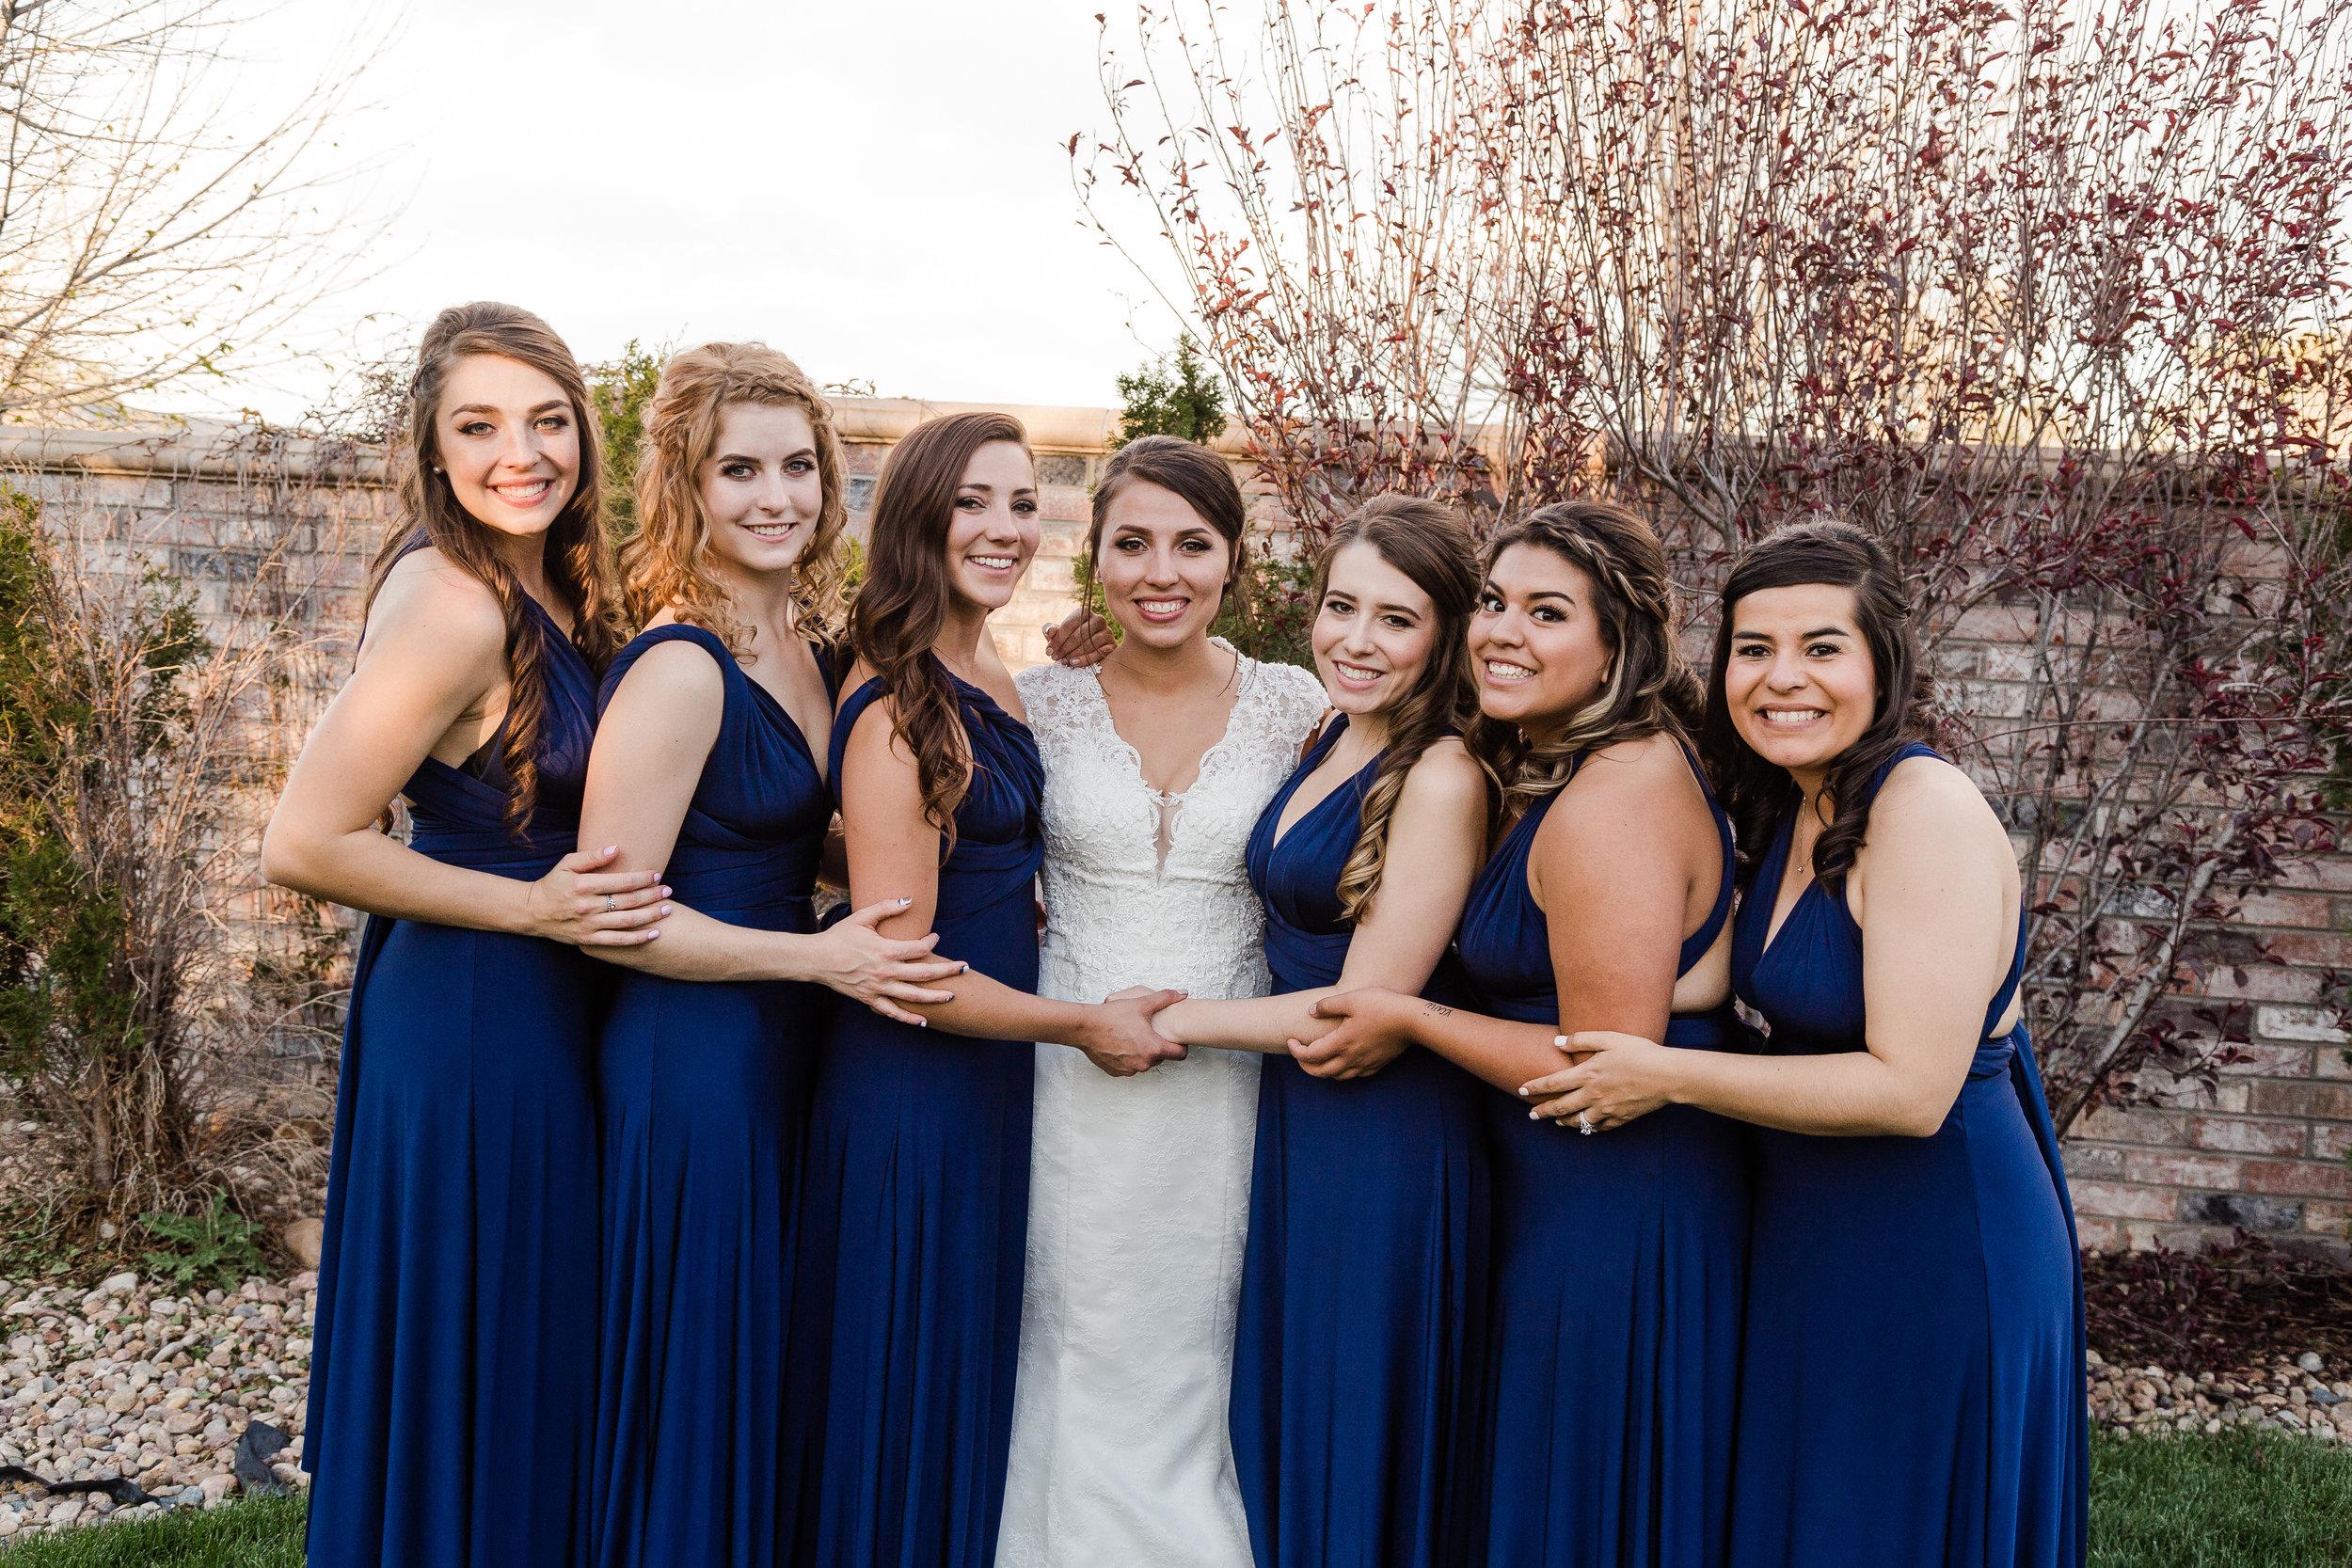 Denver-traveling-wedding-hairstylist-Colorado-updo-and-braiding-specilaist